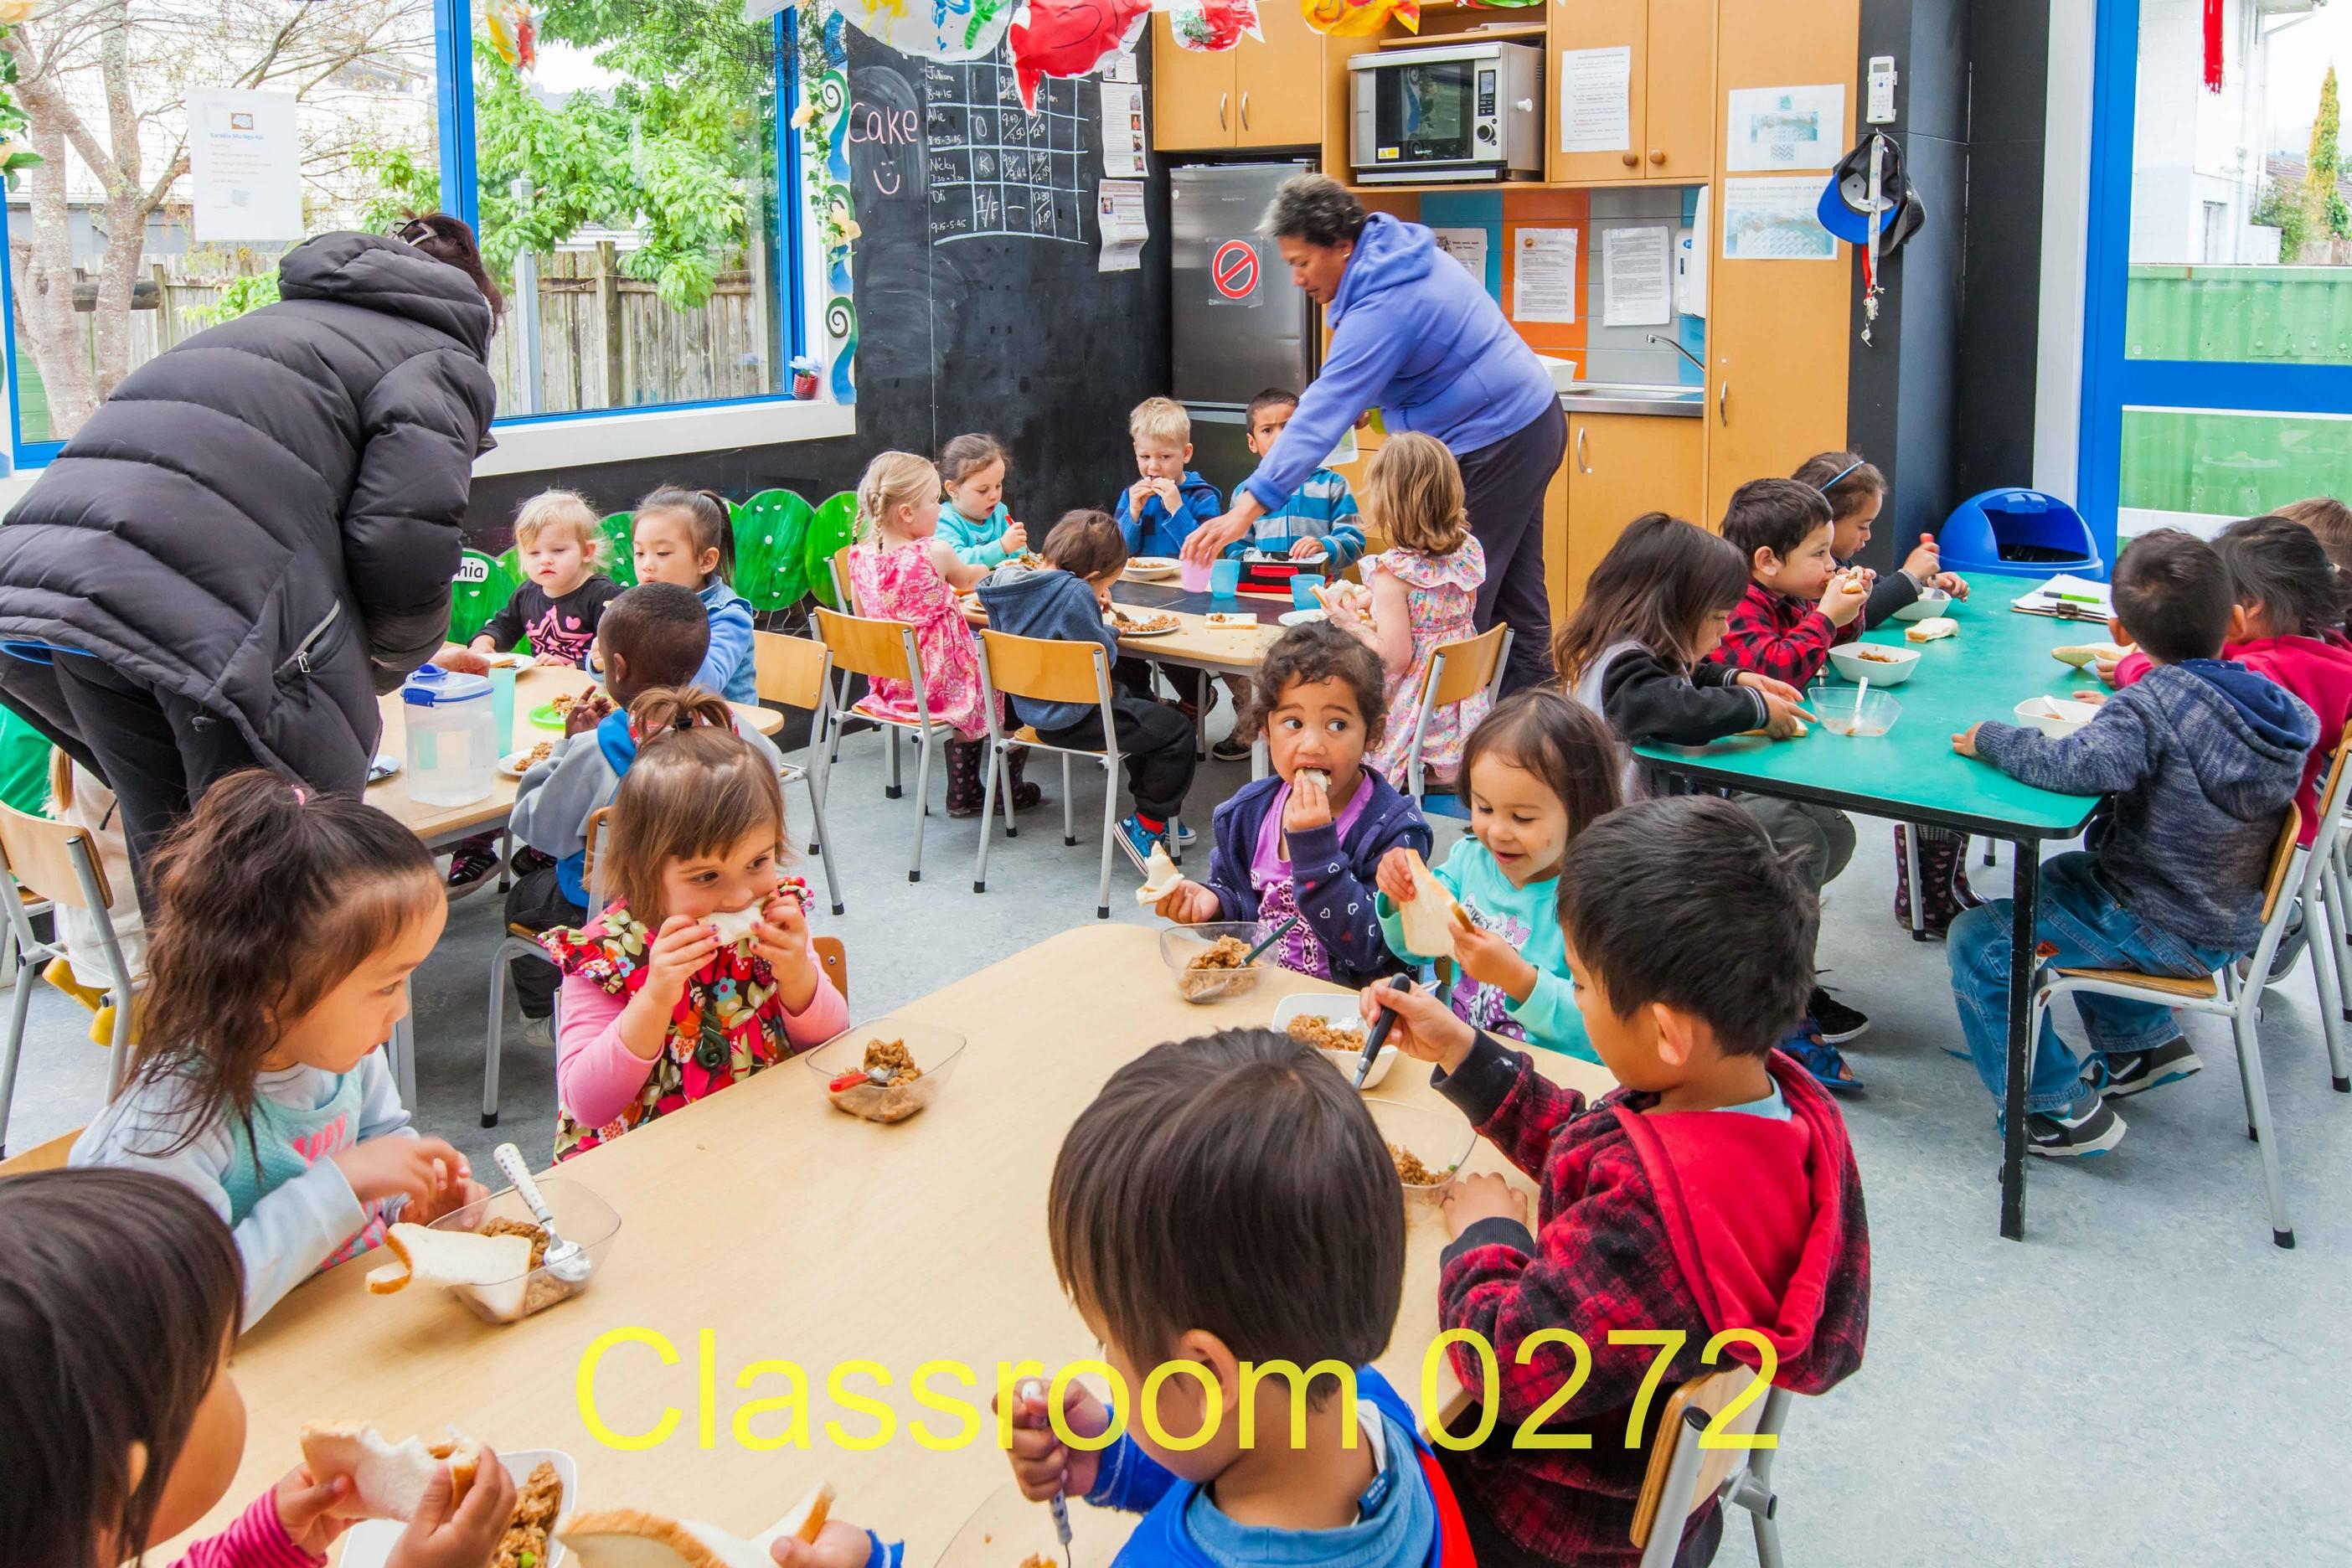 Classroom 0272